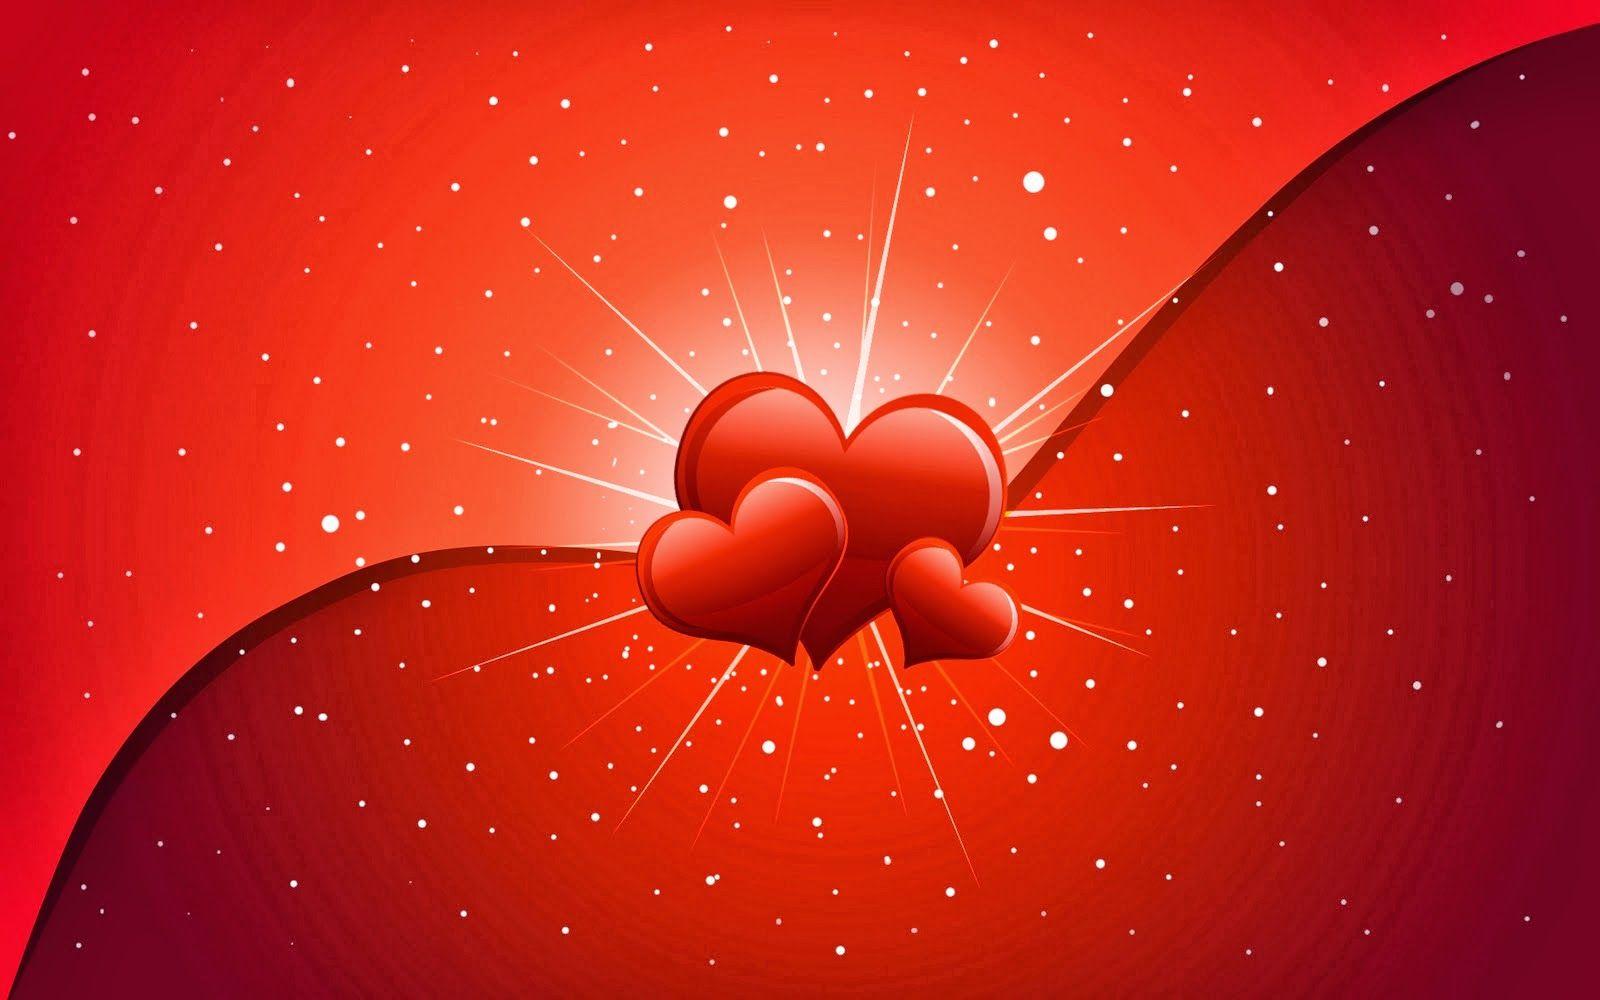 Valentine Hd Wallpapers Desktop Wallpaper Design Valentine Wallpaper Hd Valentines Wallpaper